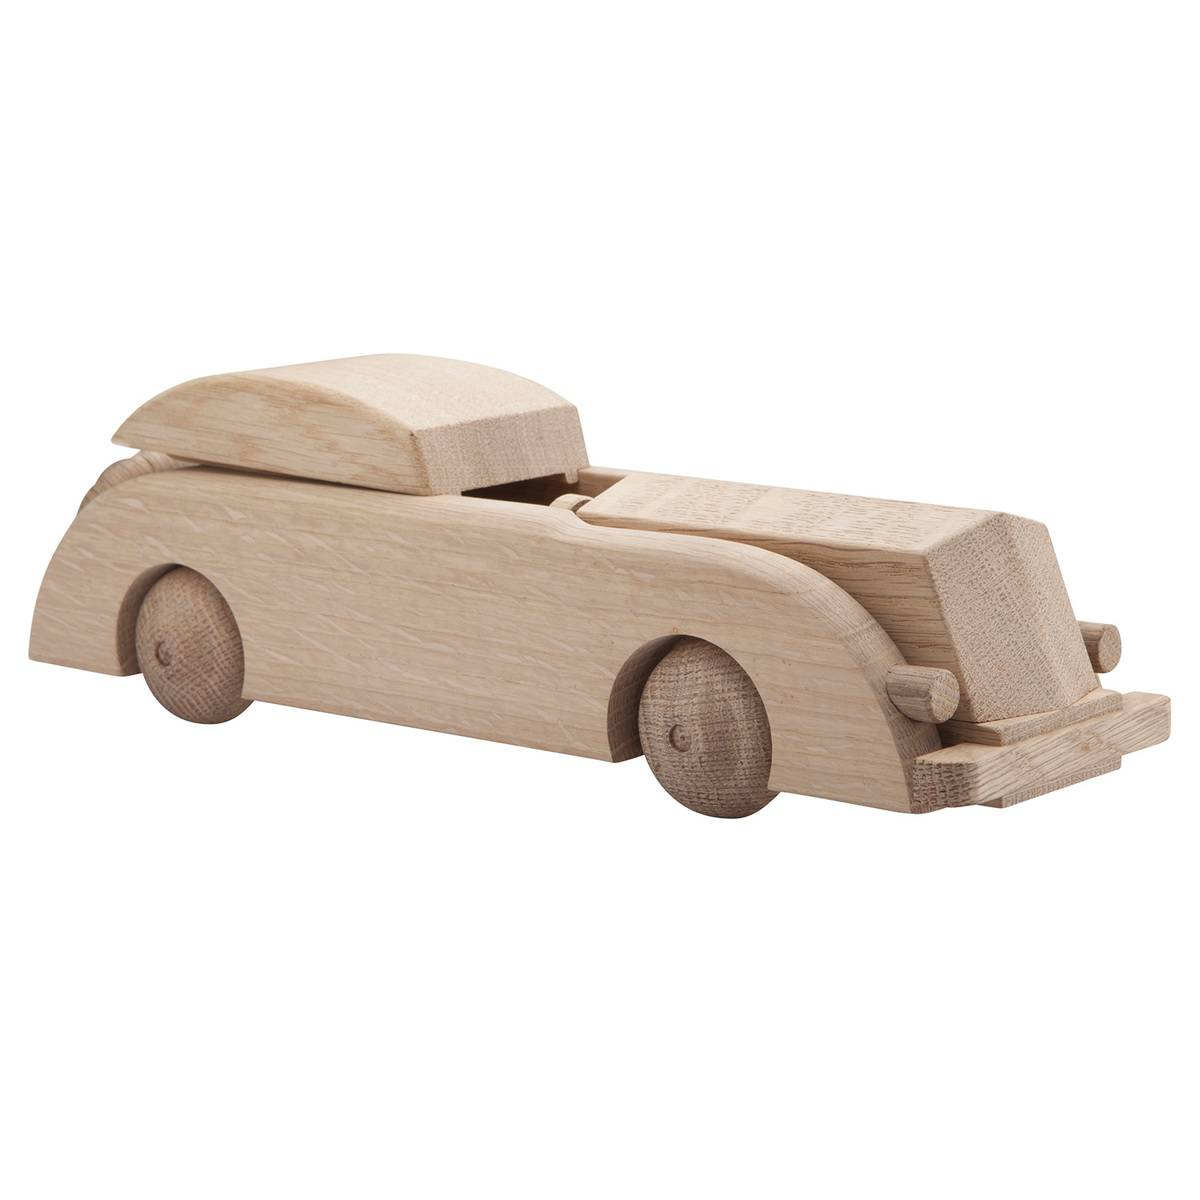 Kay Bojesen Limousine wooden car, oak, large